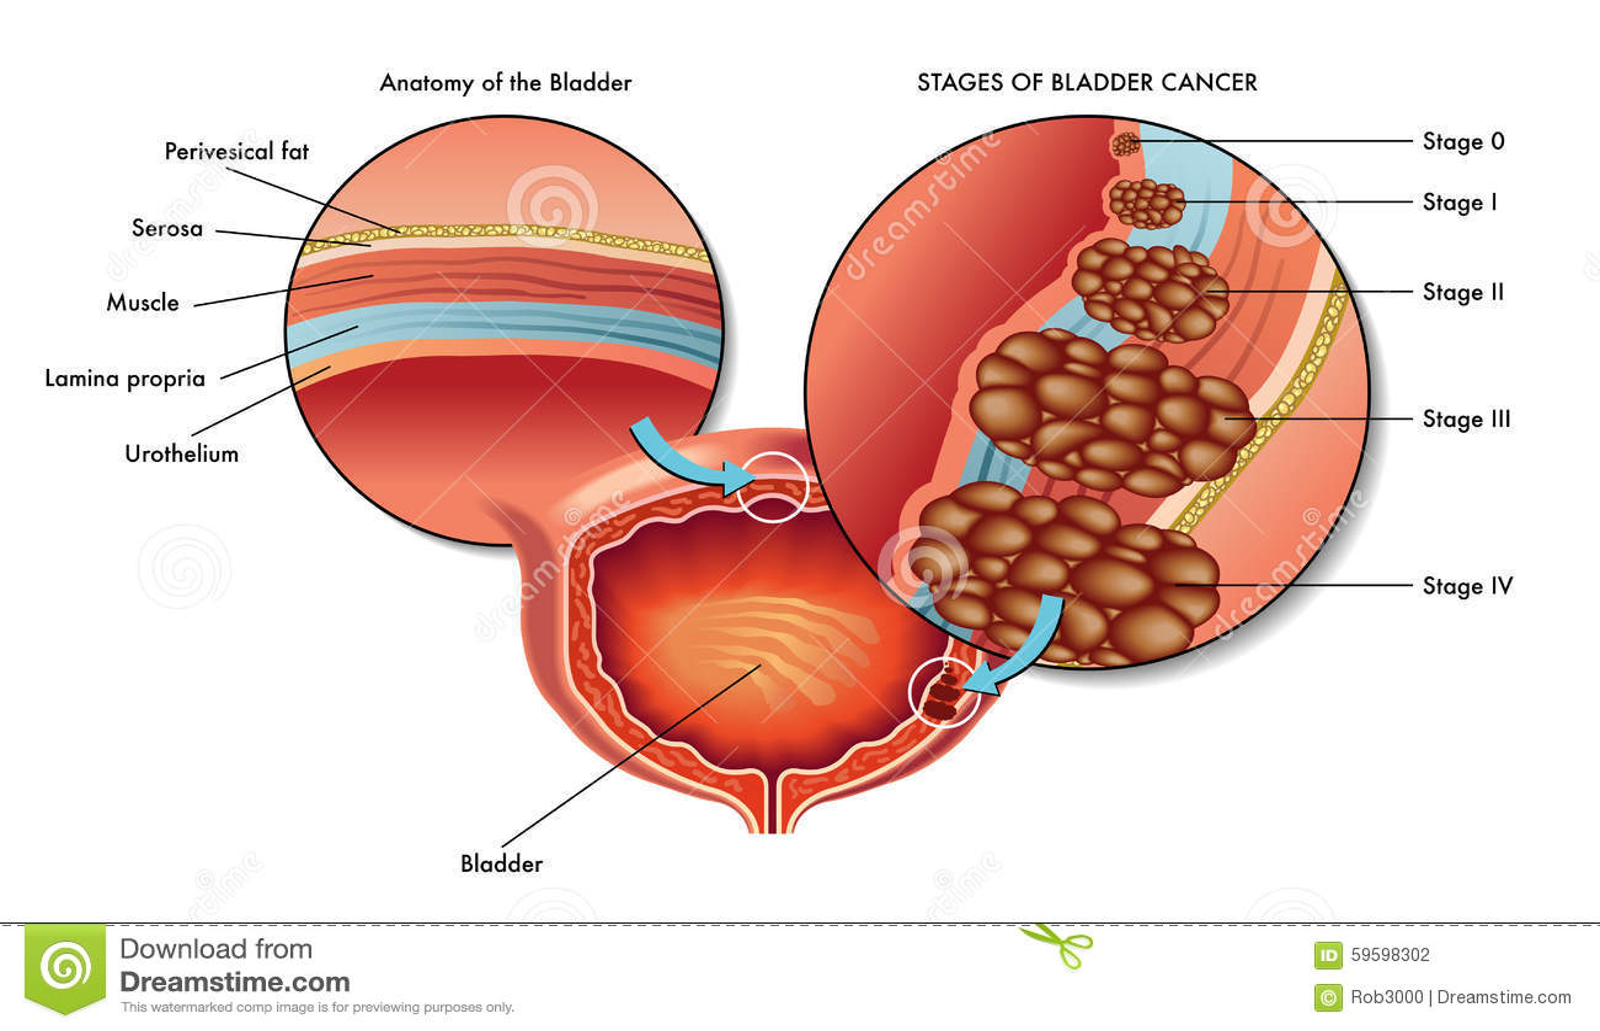 Male bladder Cancer stock vector. Illustration of urinate - 59598302